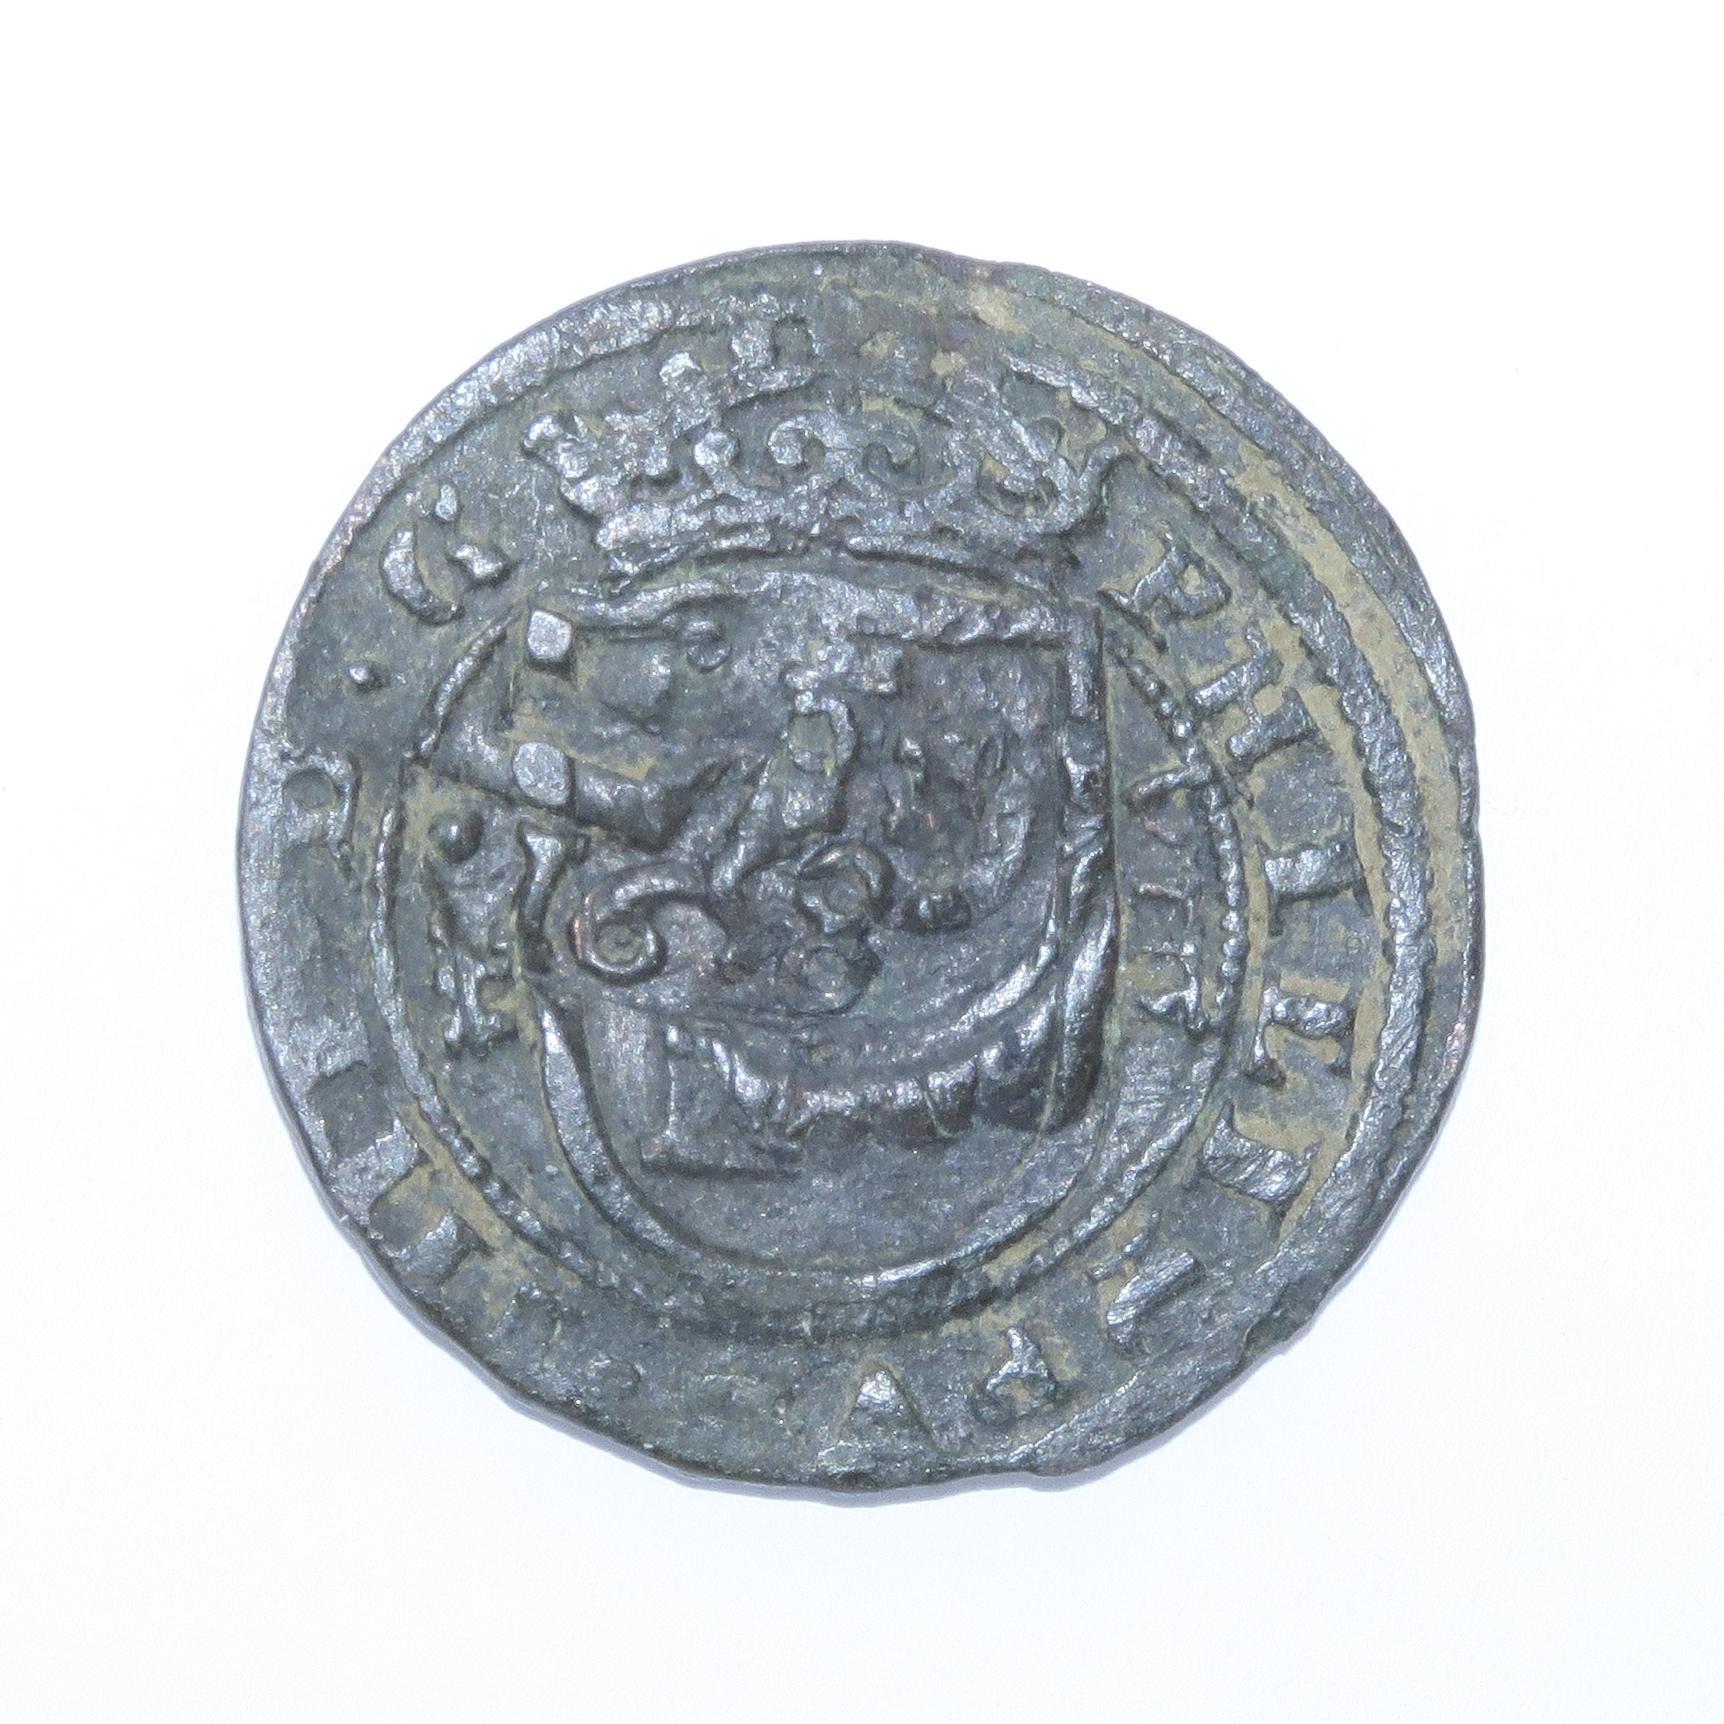 8 Maravedis 1614 e Felipe III de 1614 (ceca Segovia) resellados Anvers13